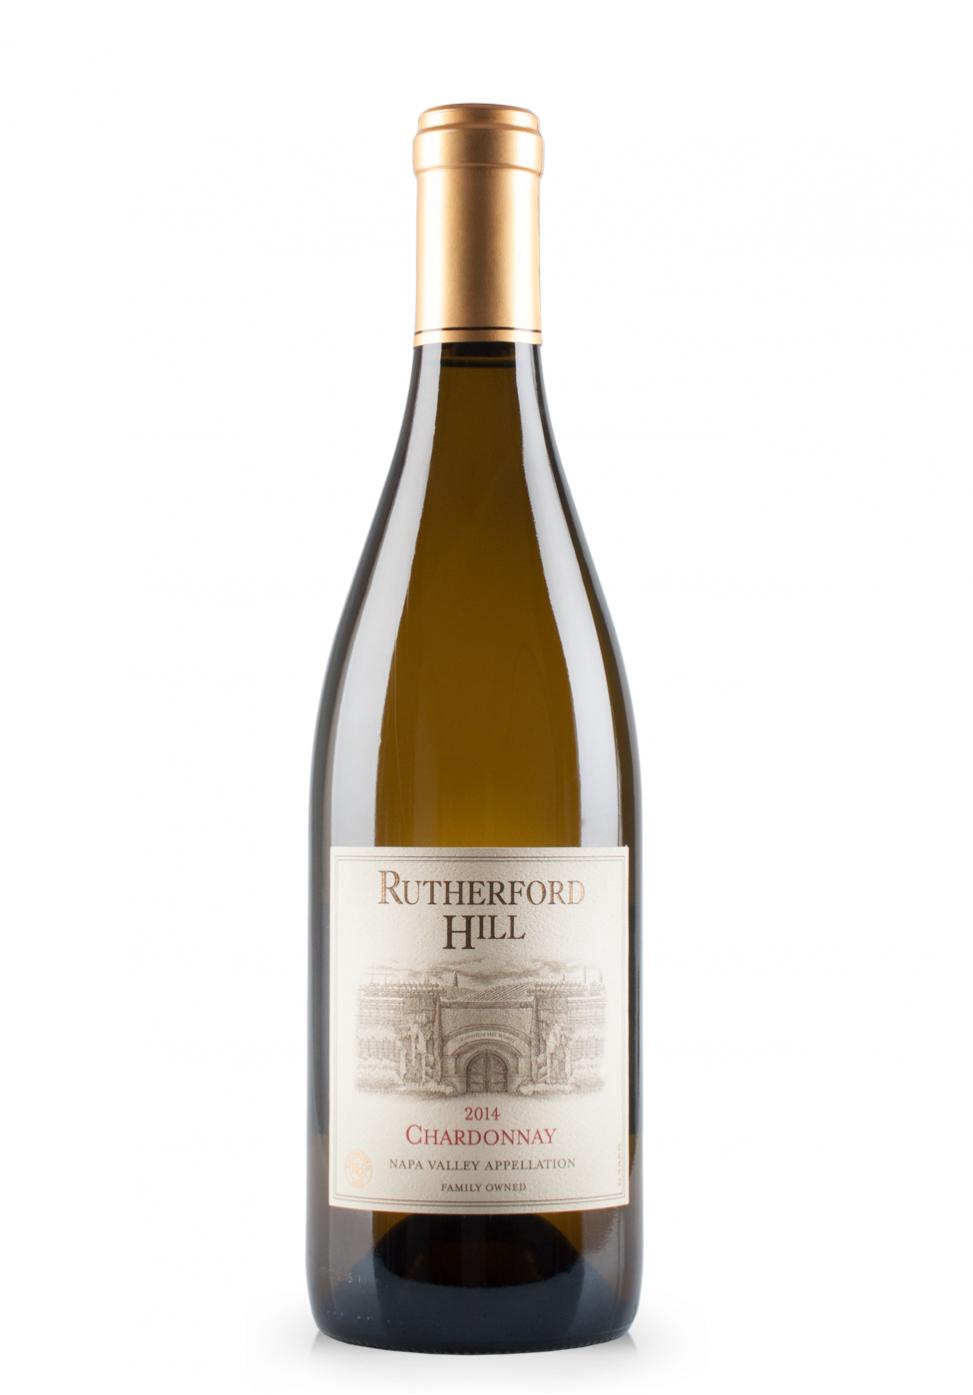 Vin Rutherford Appellation, Napa Valley, Chardonnay 2015 (0.75L)